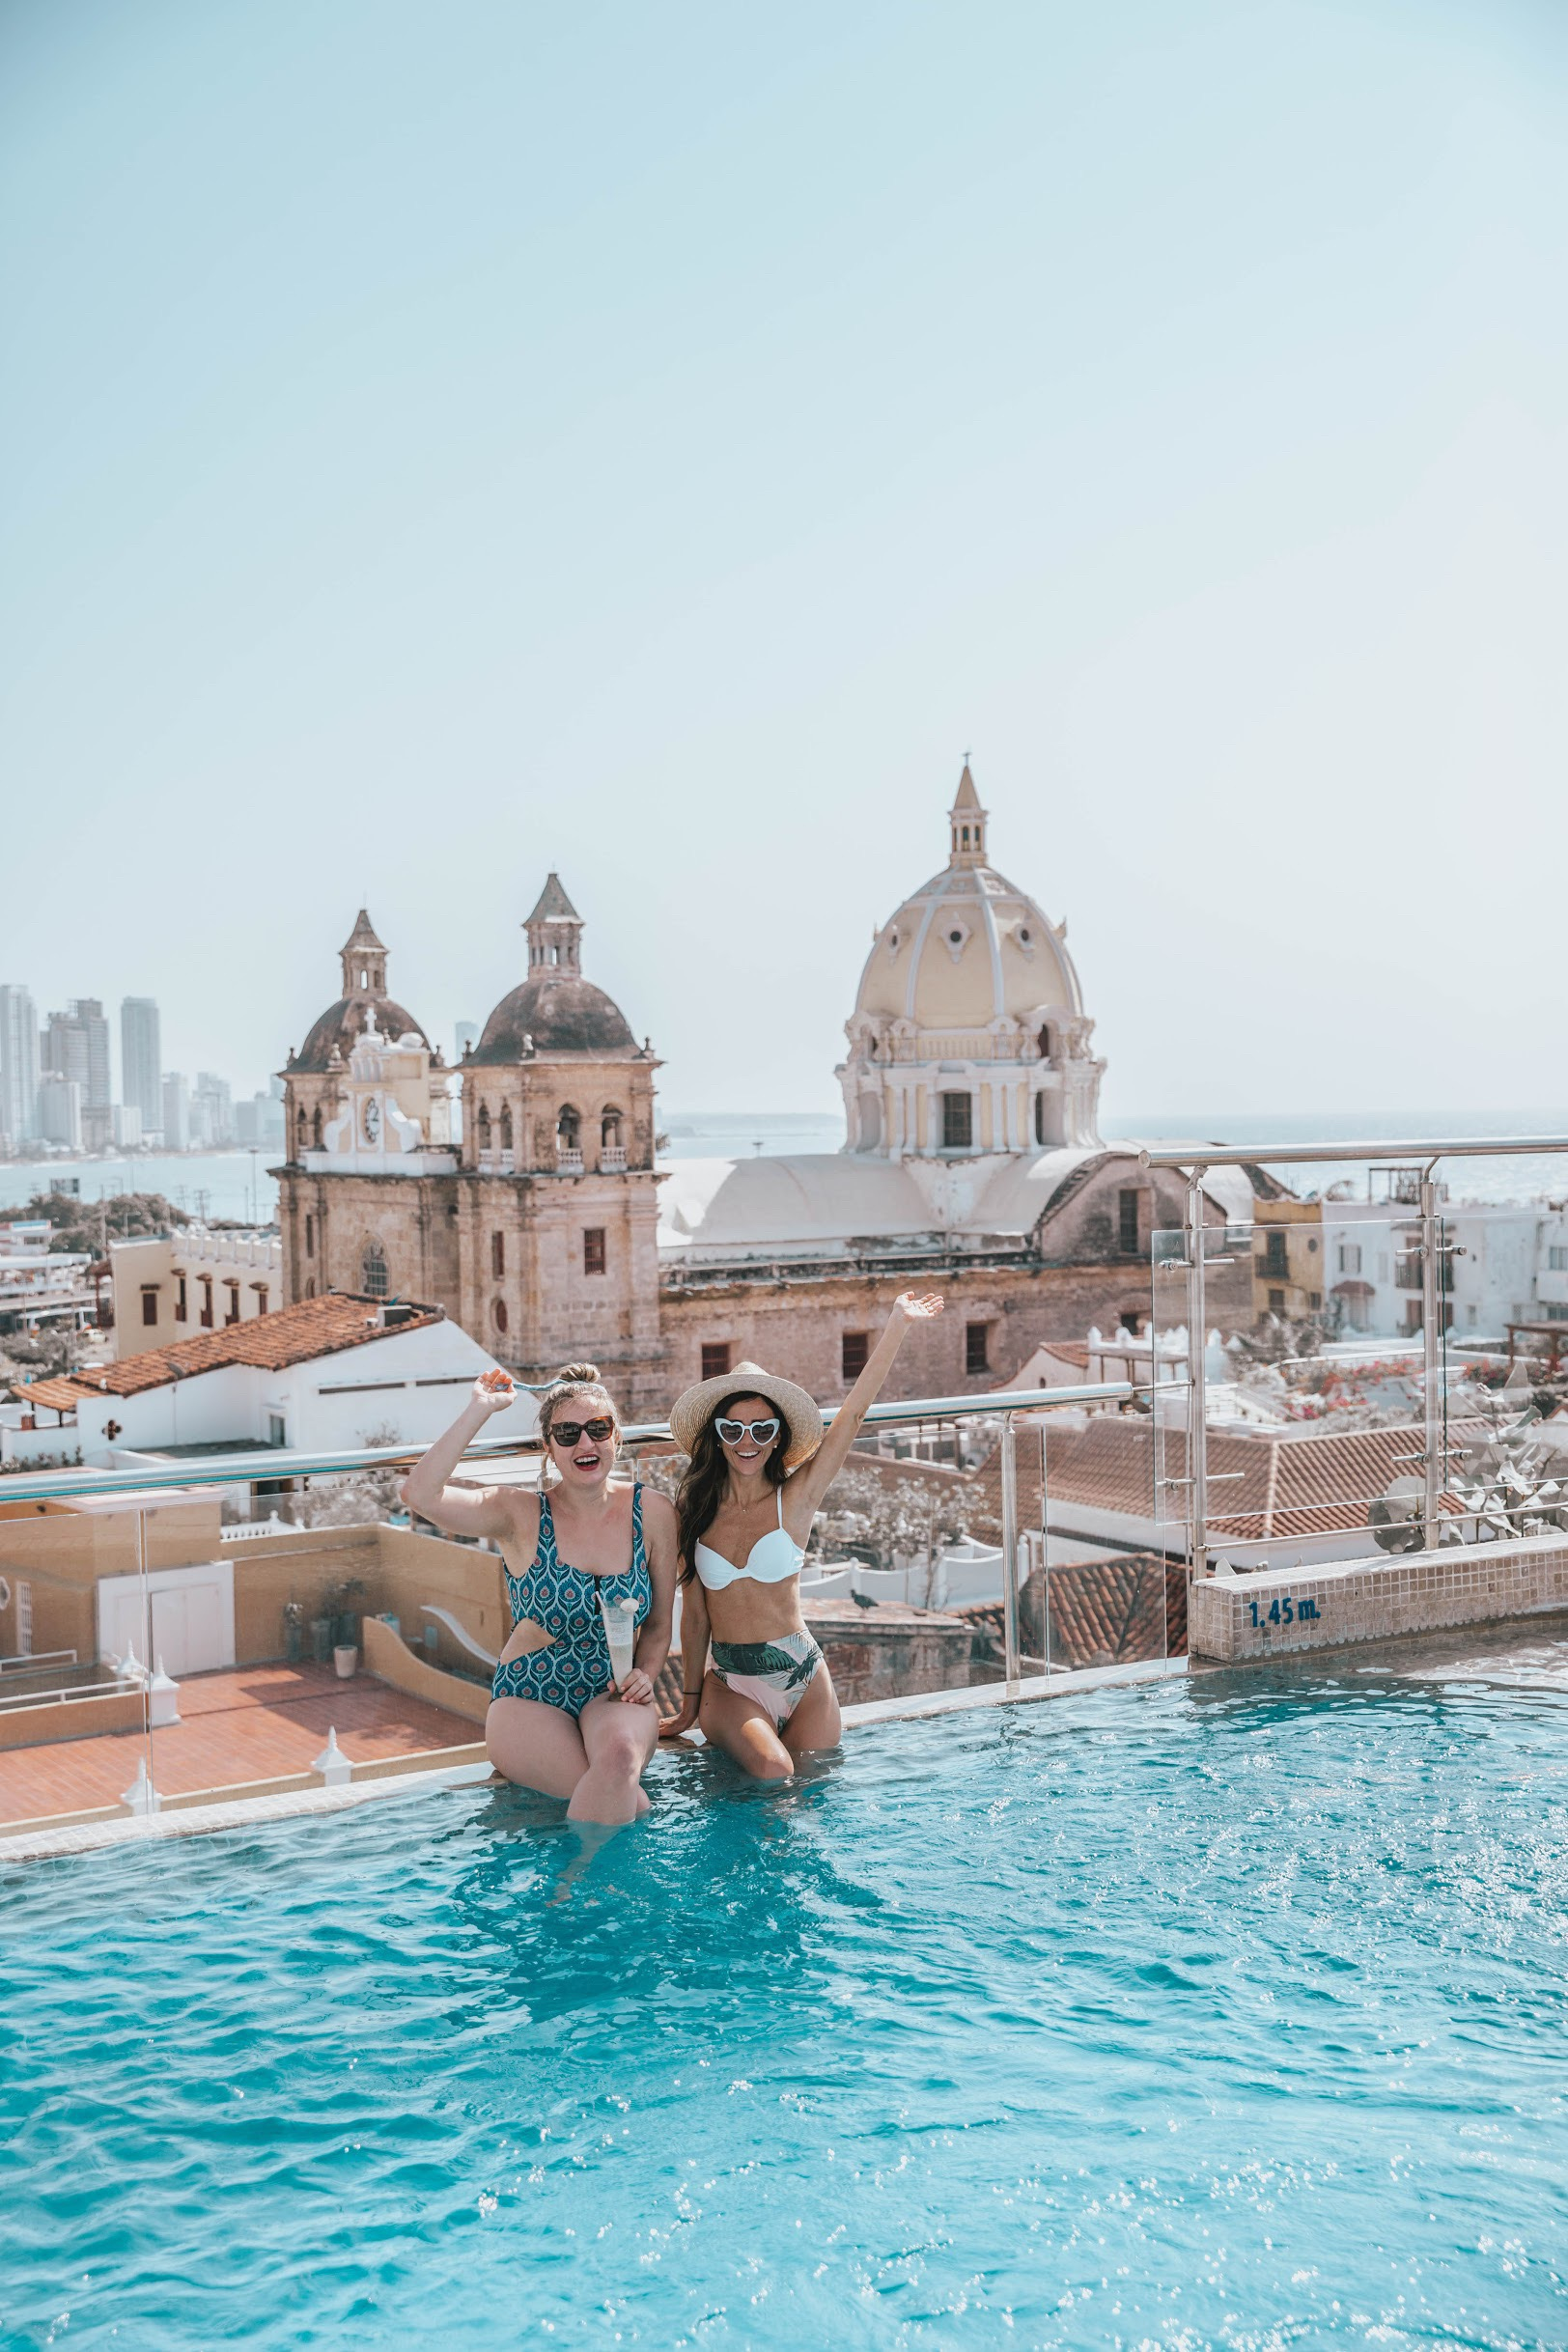 movich hotel rooftop pool cartagena